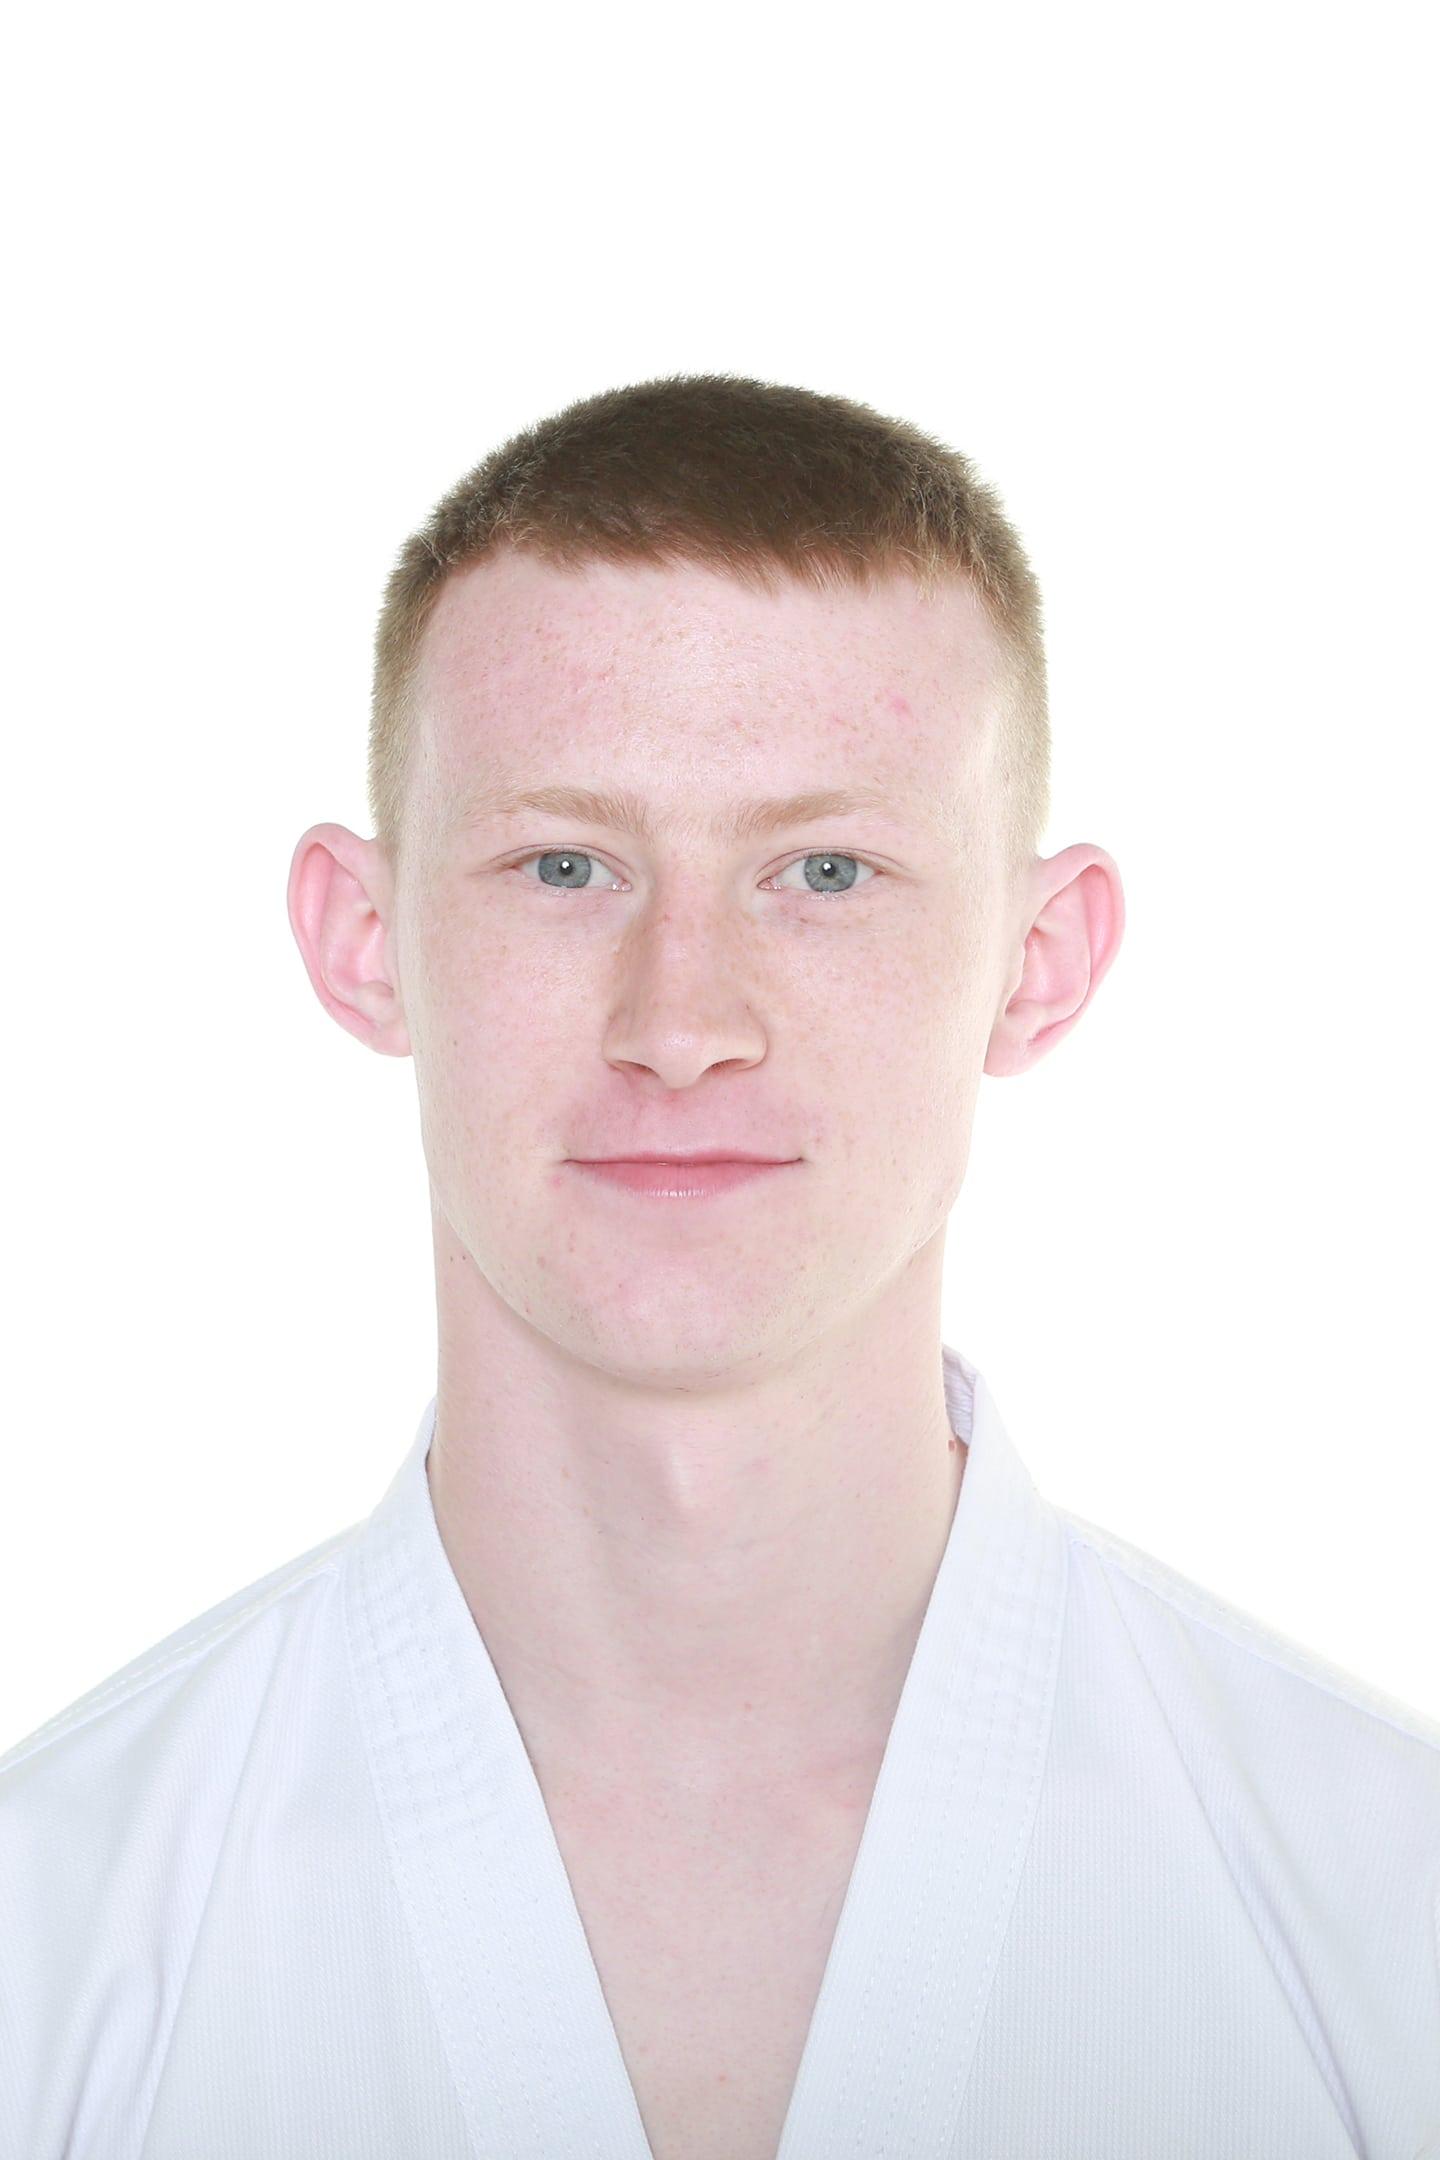 Daniel Donnelly in Balbriggan - Elite Taekwondo Academy